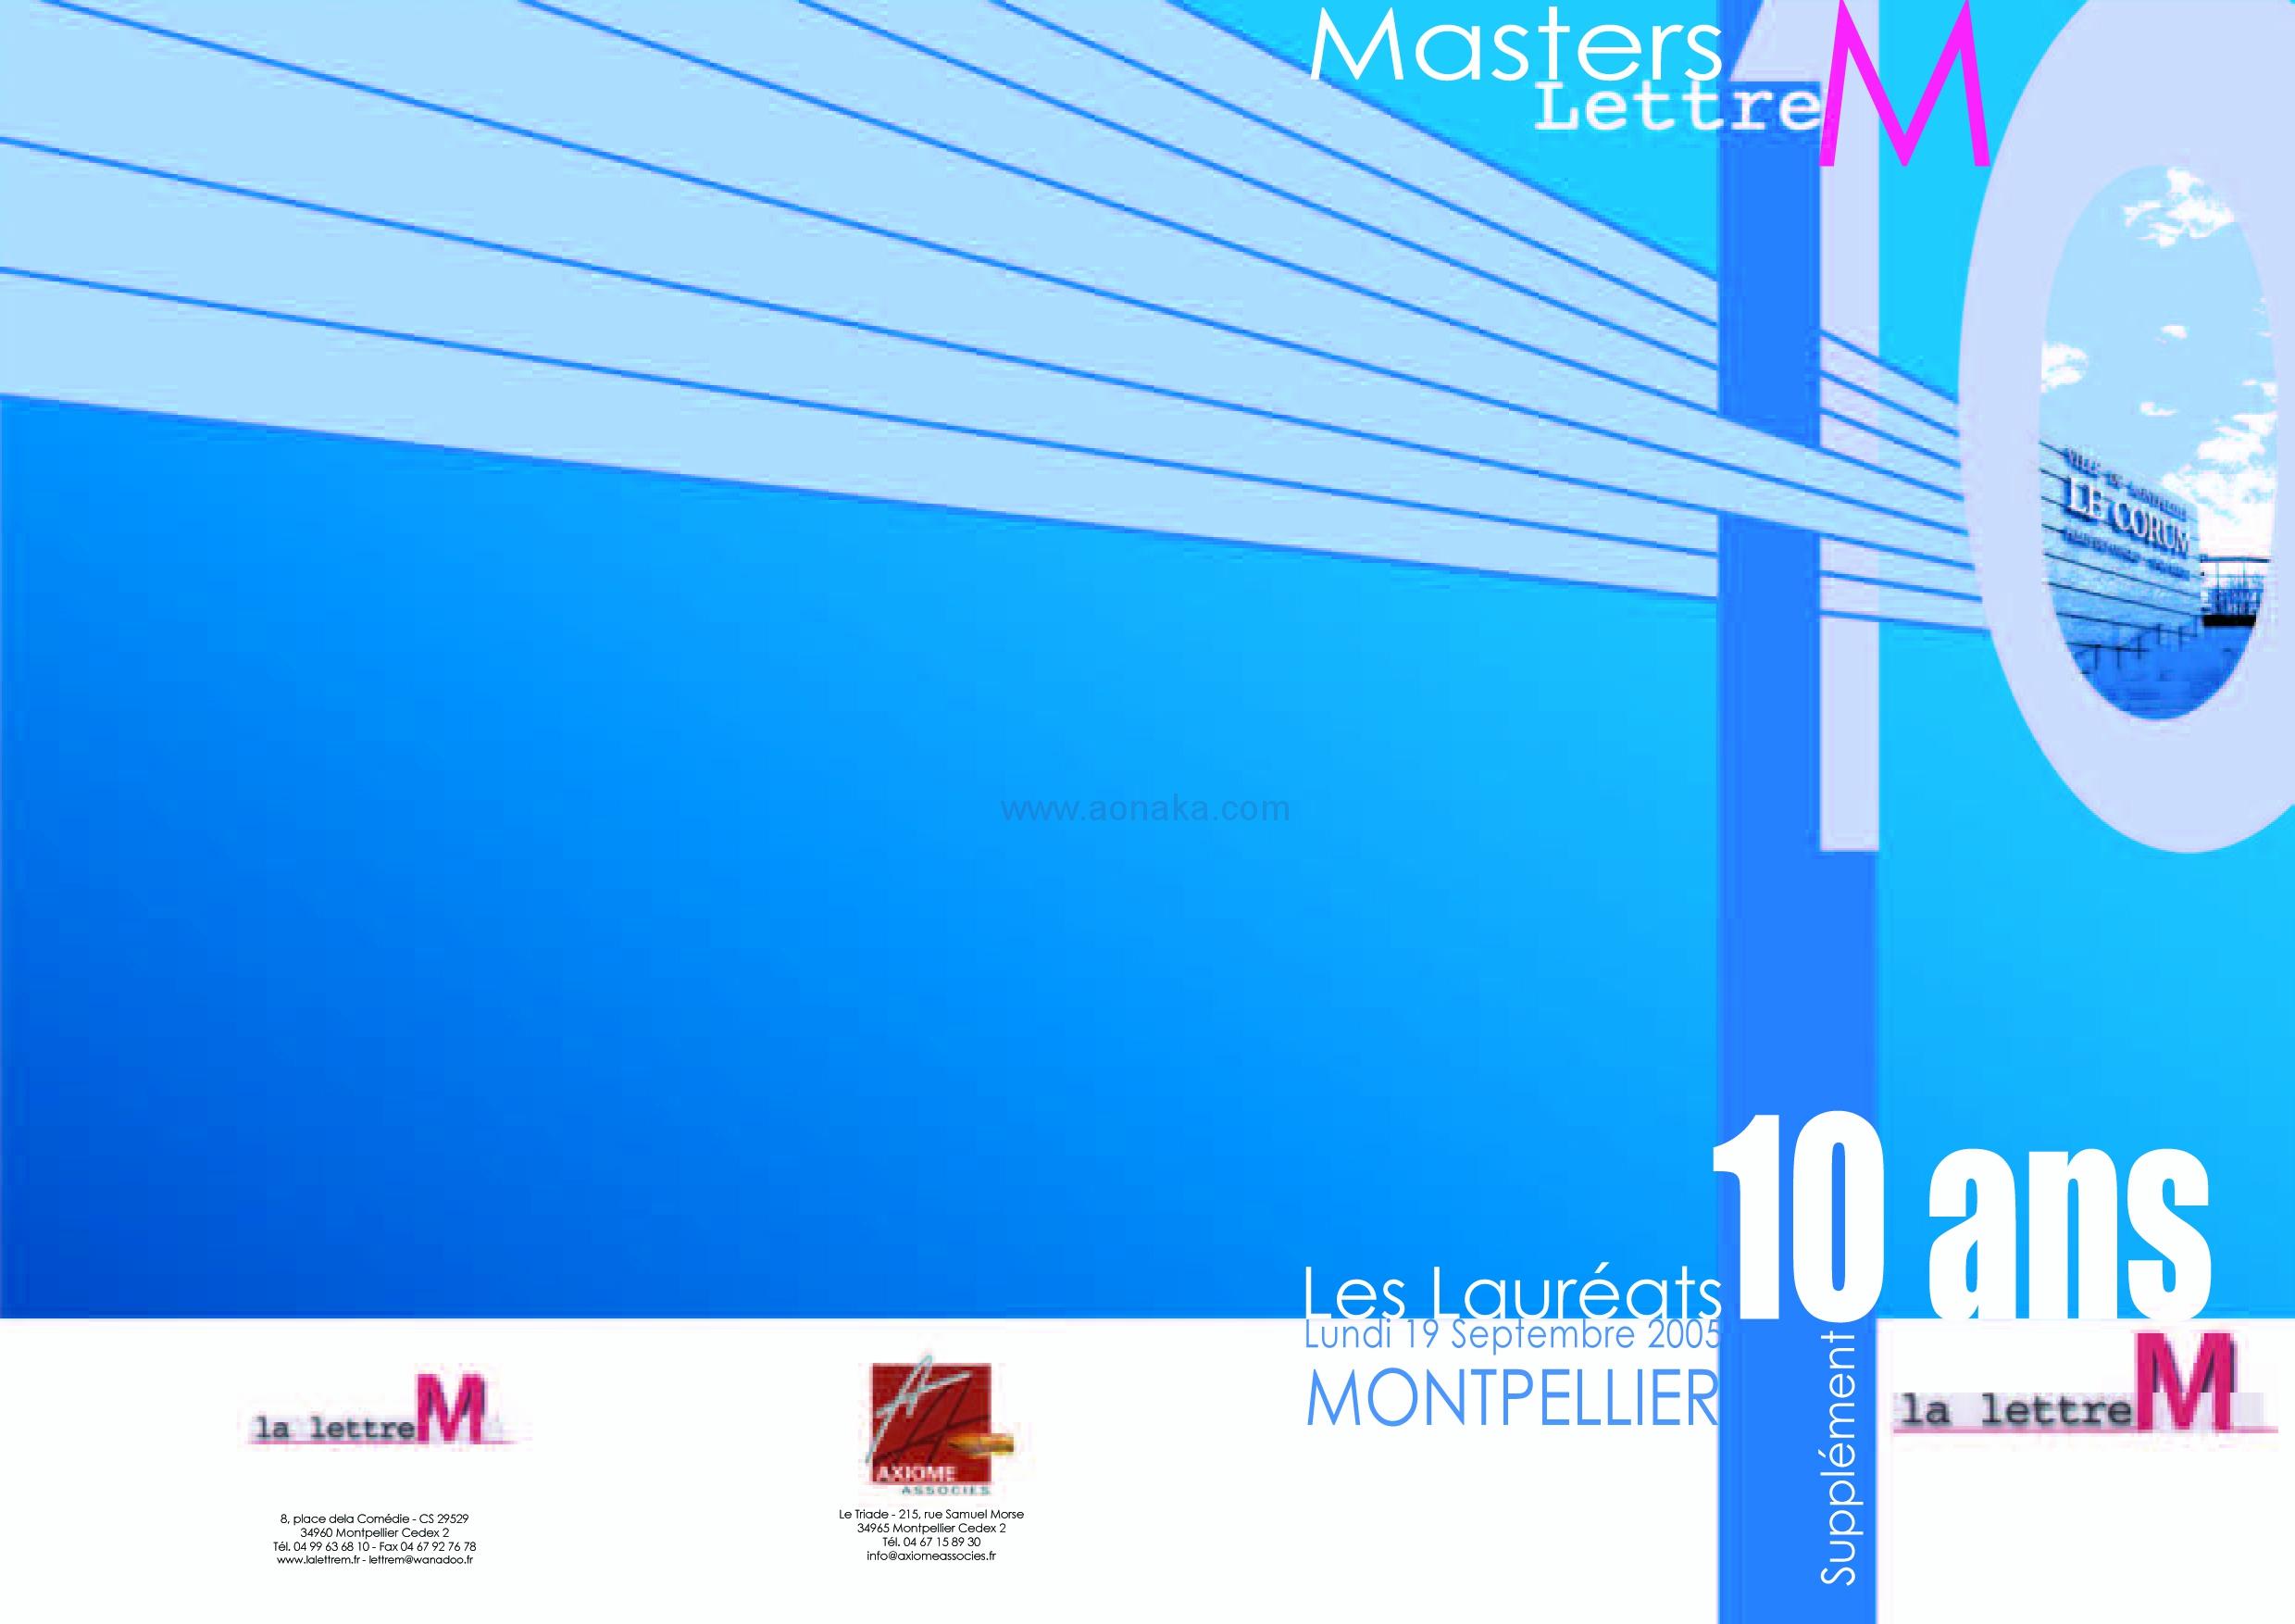 couv masters lettre M 2.jpg